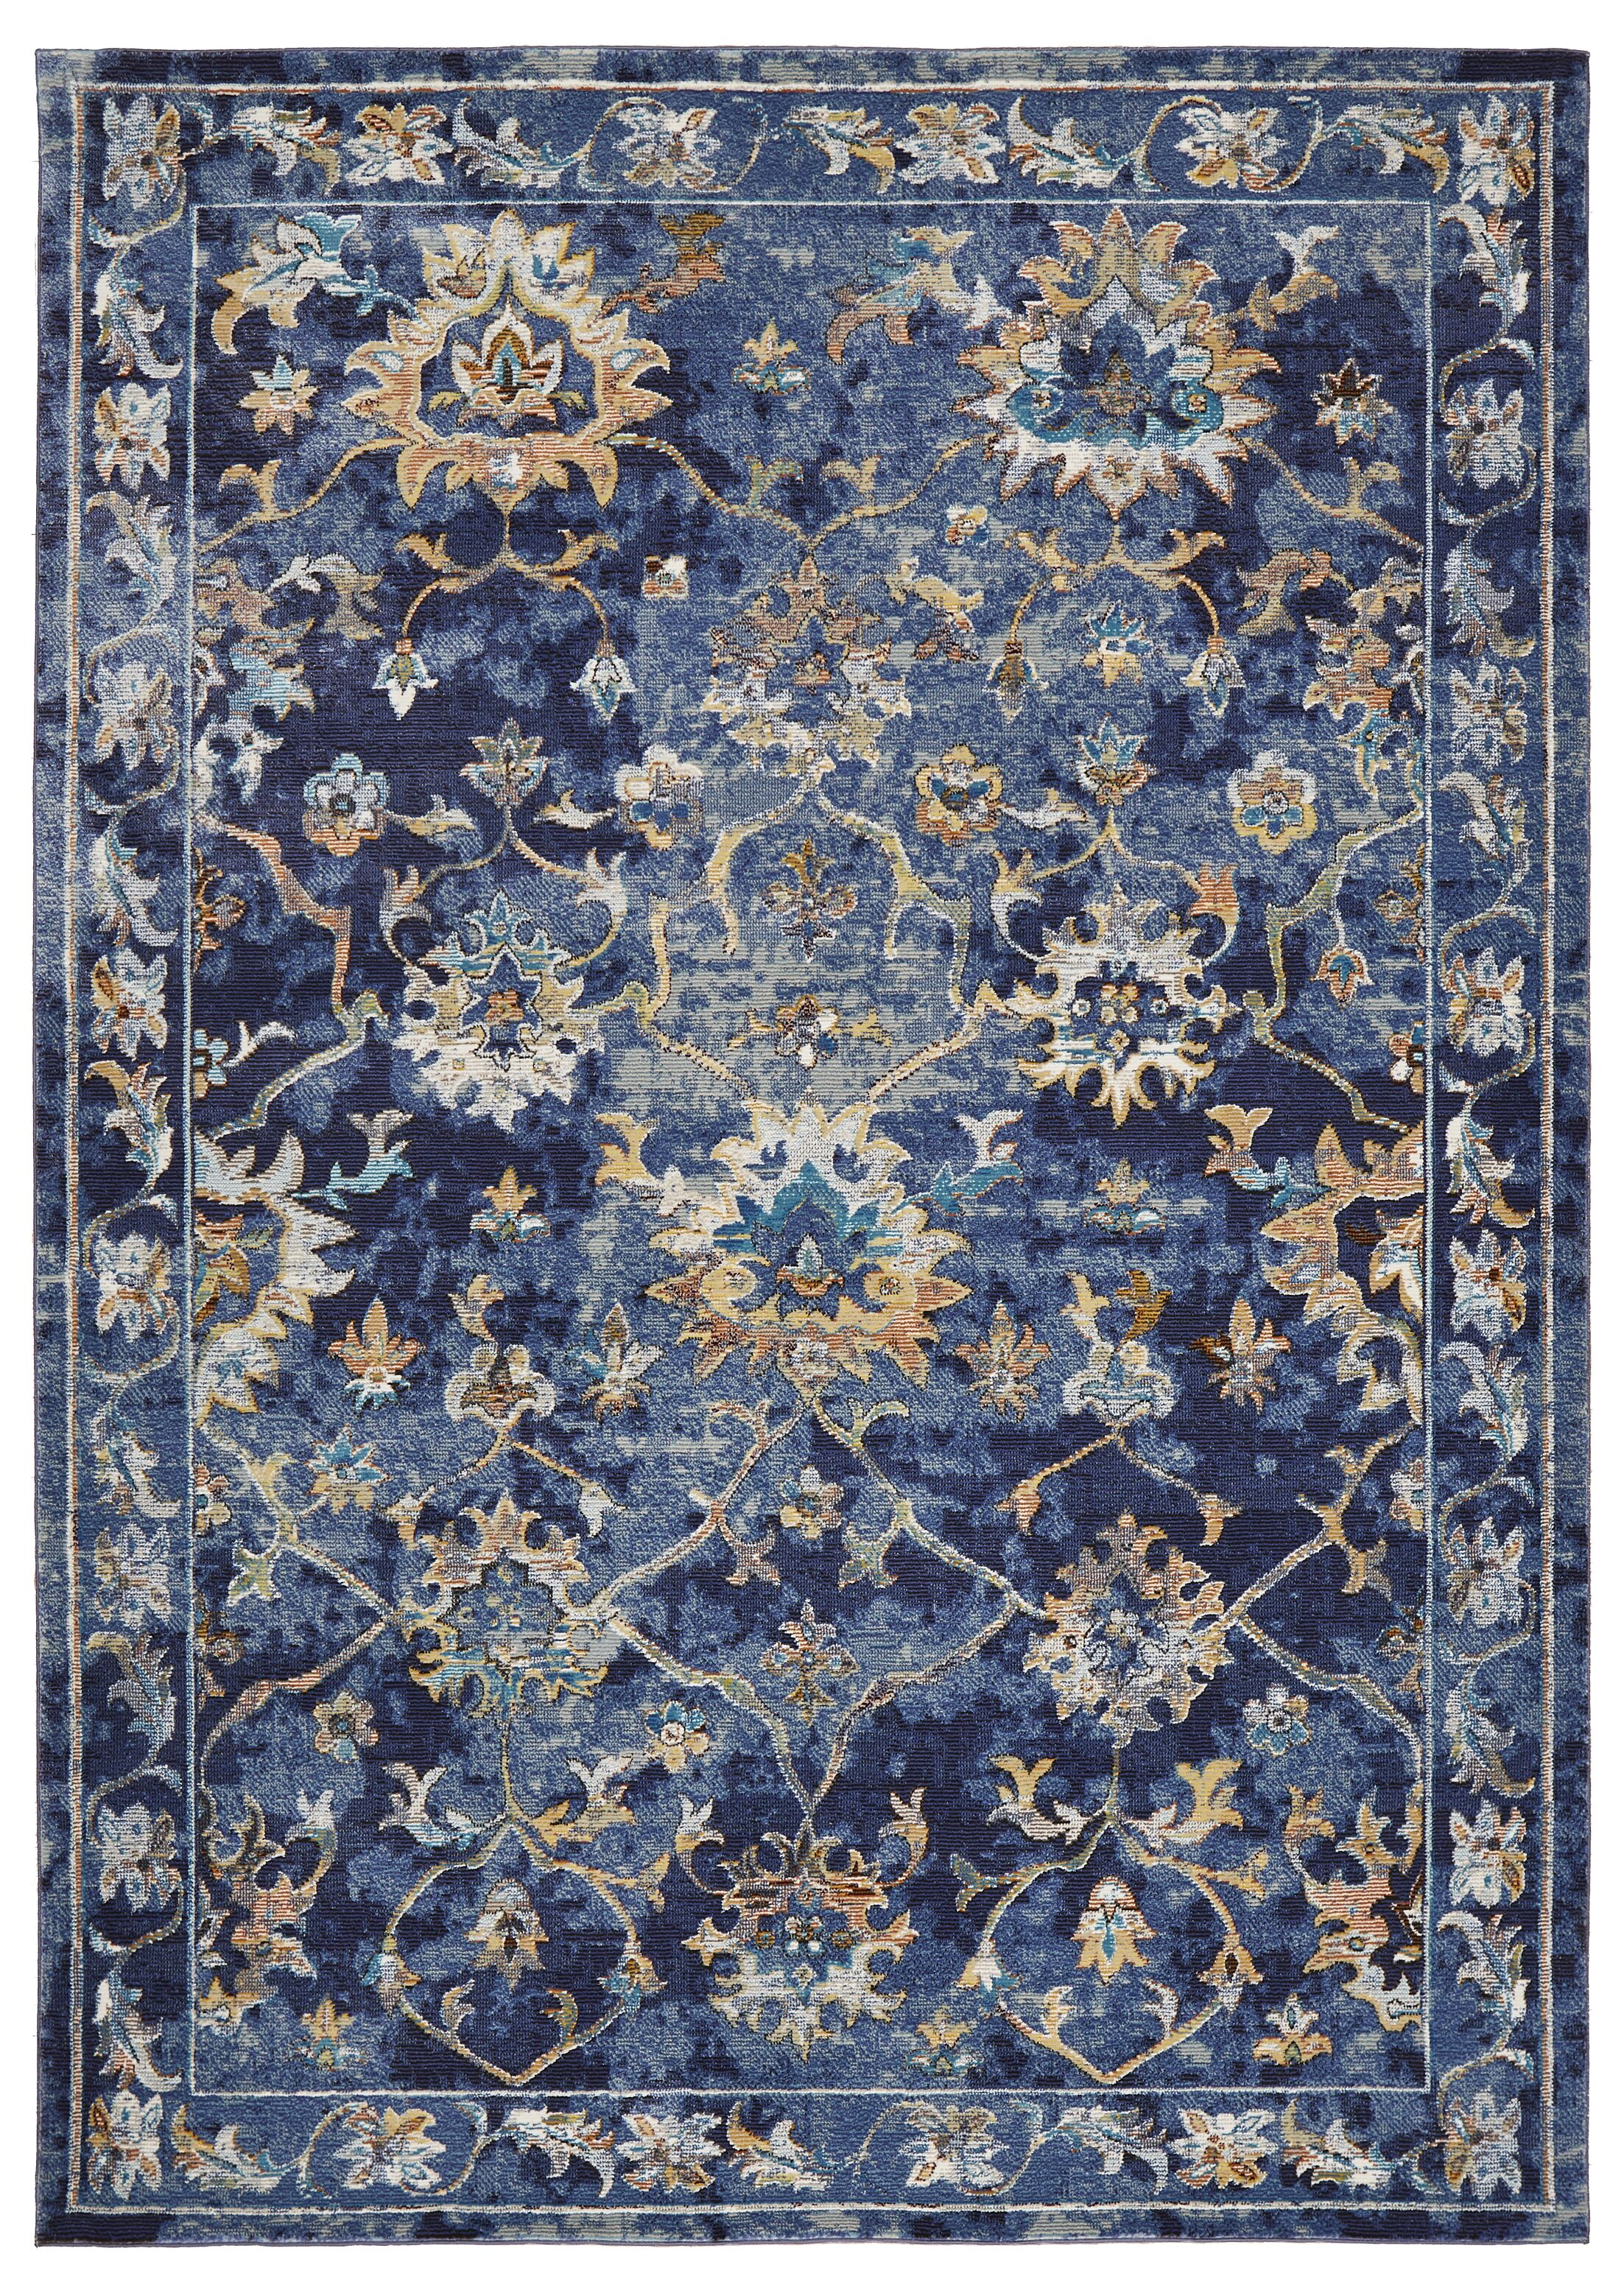 Amory Contemporary Jacobean Blue Area Rug Rug Size: Rectangle 4' x 6'